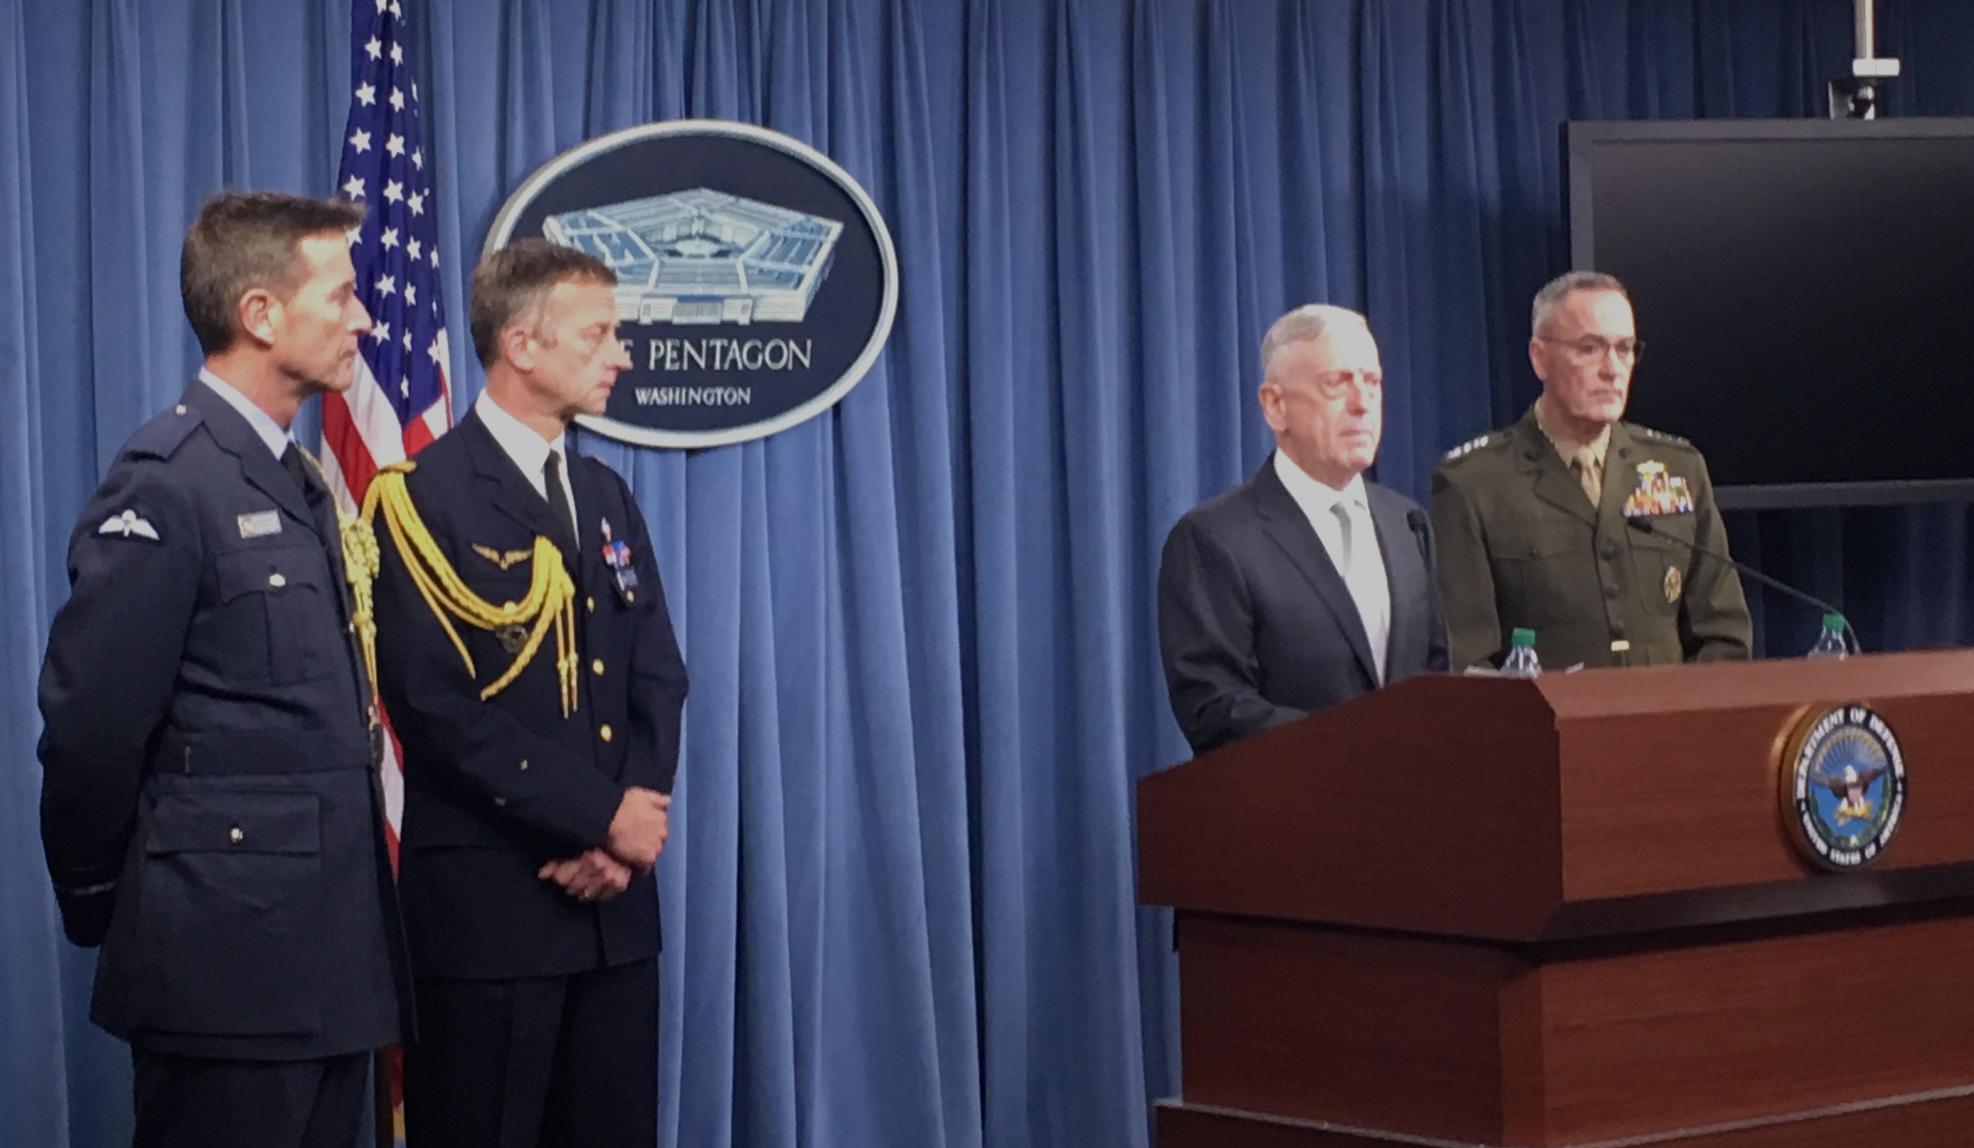 Mattis Briefing 4:13 Syria attack